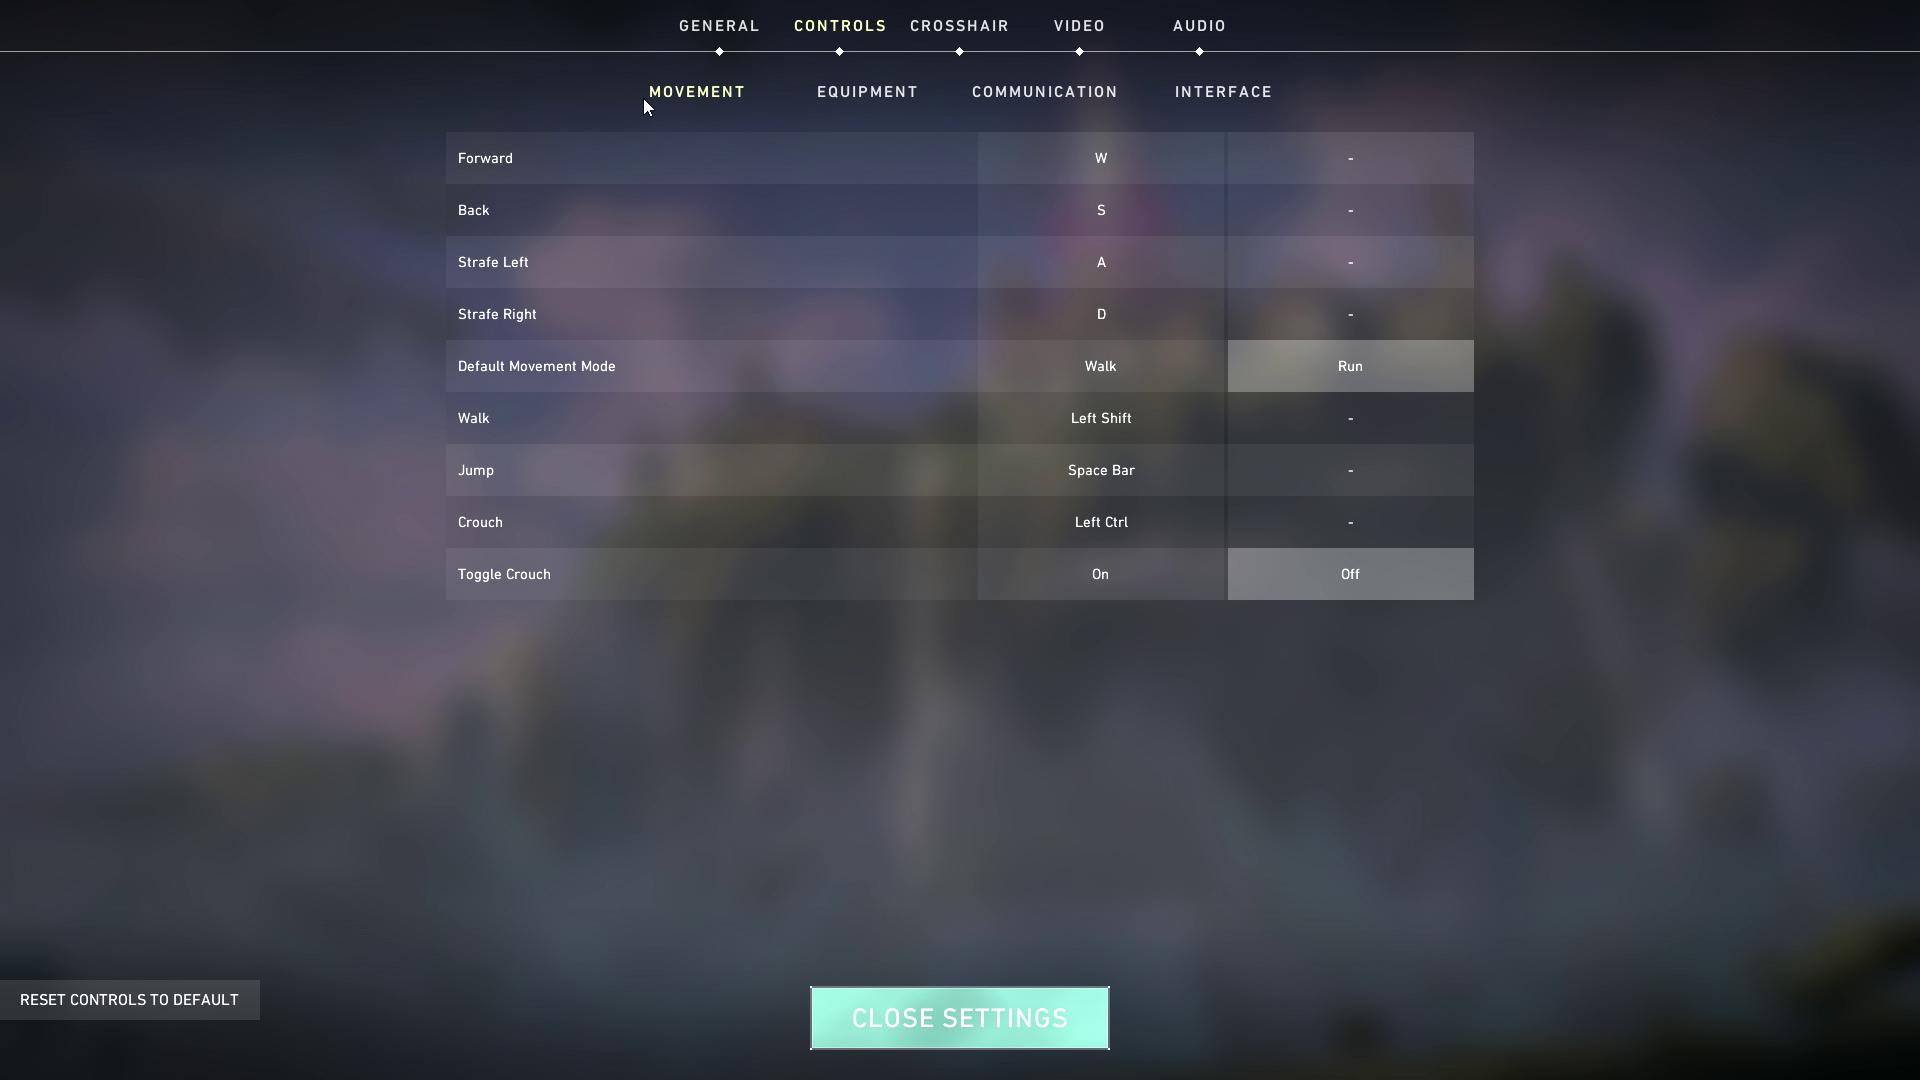 VALORANT key bind settings page